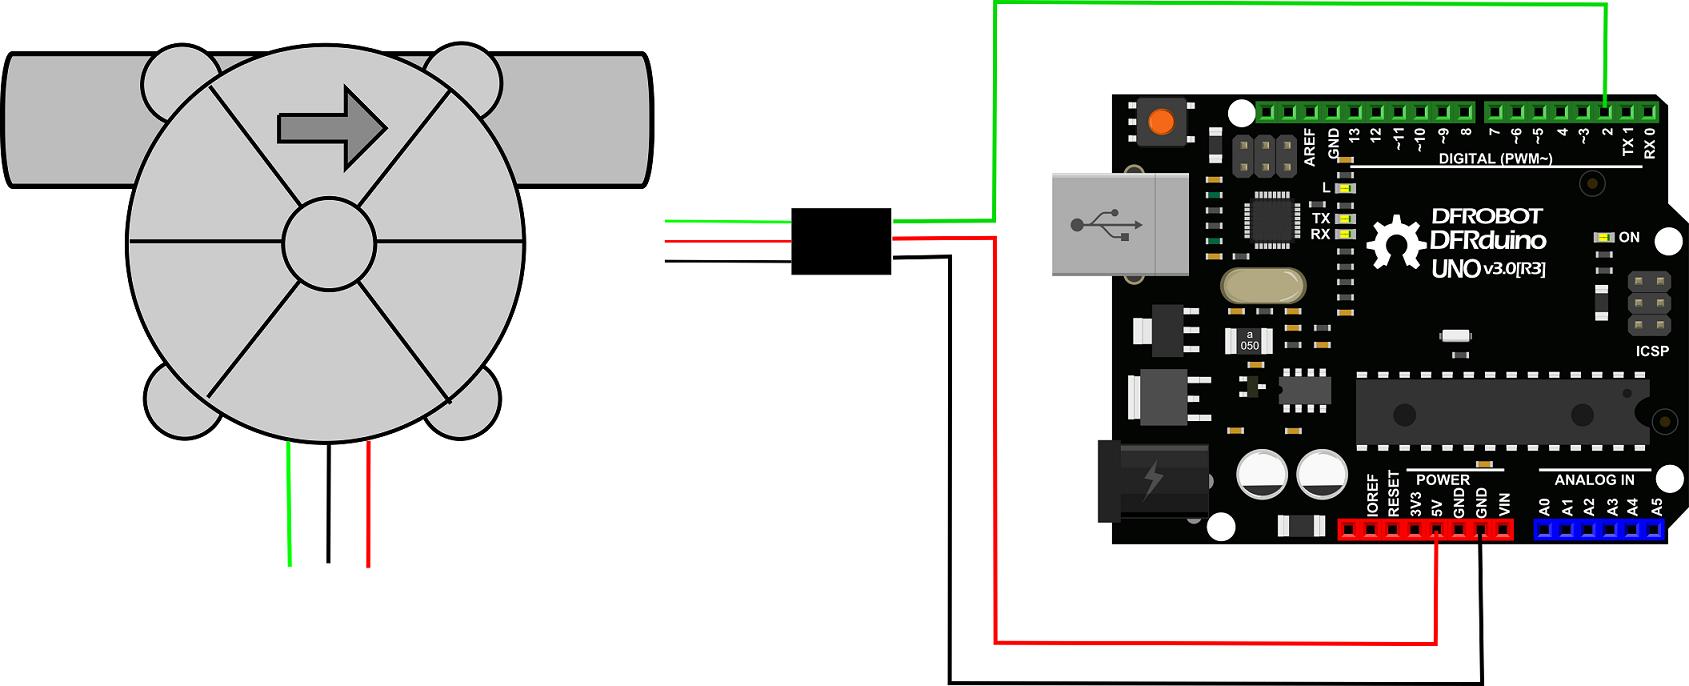 10001 P270 Smoke Duct Detector Wiring Diagram